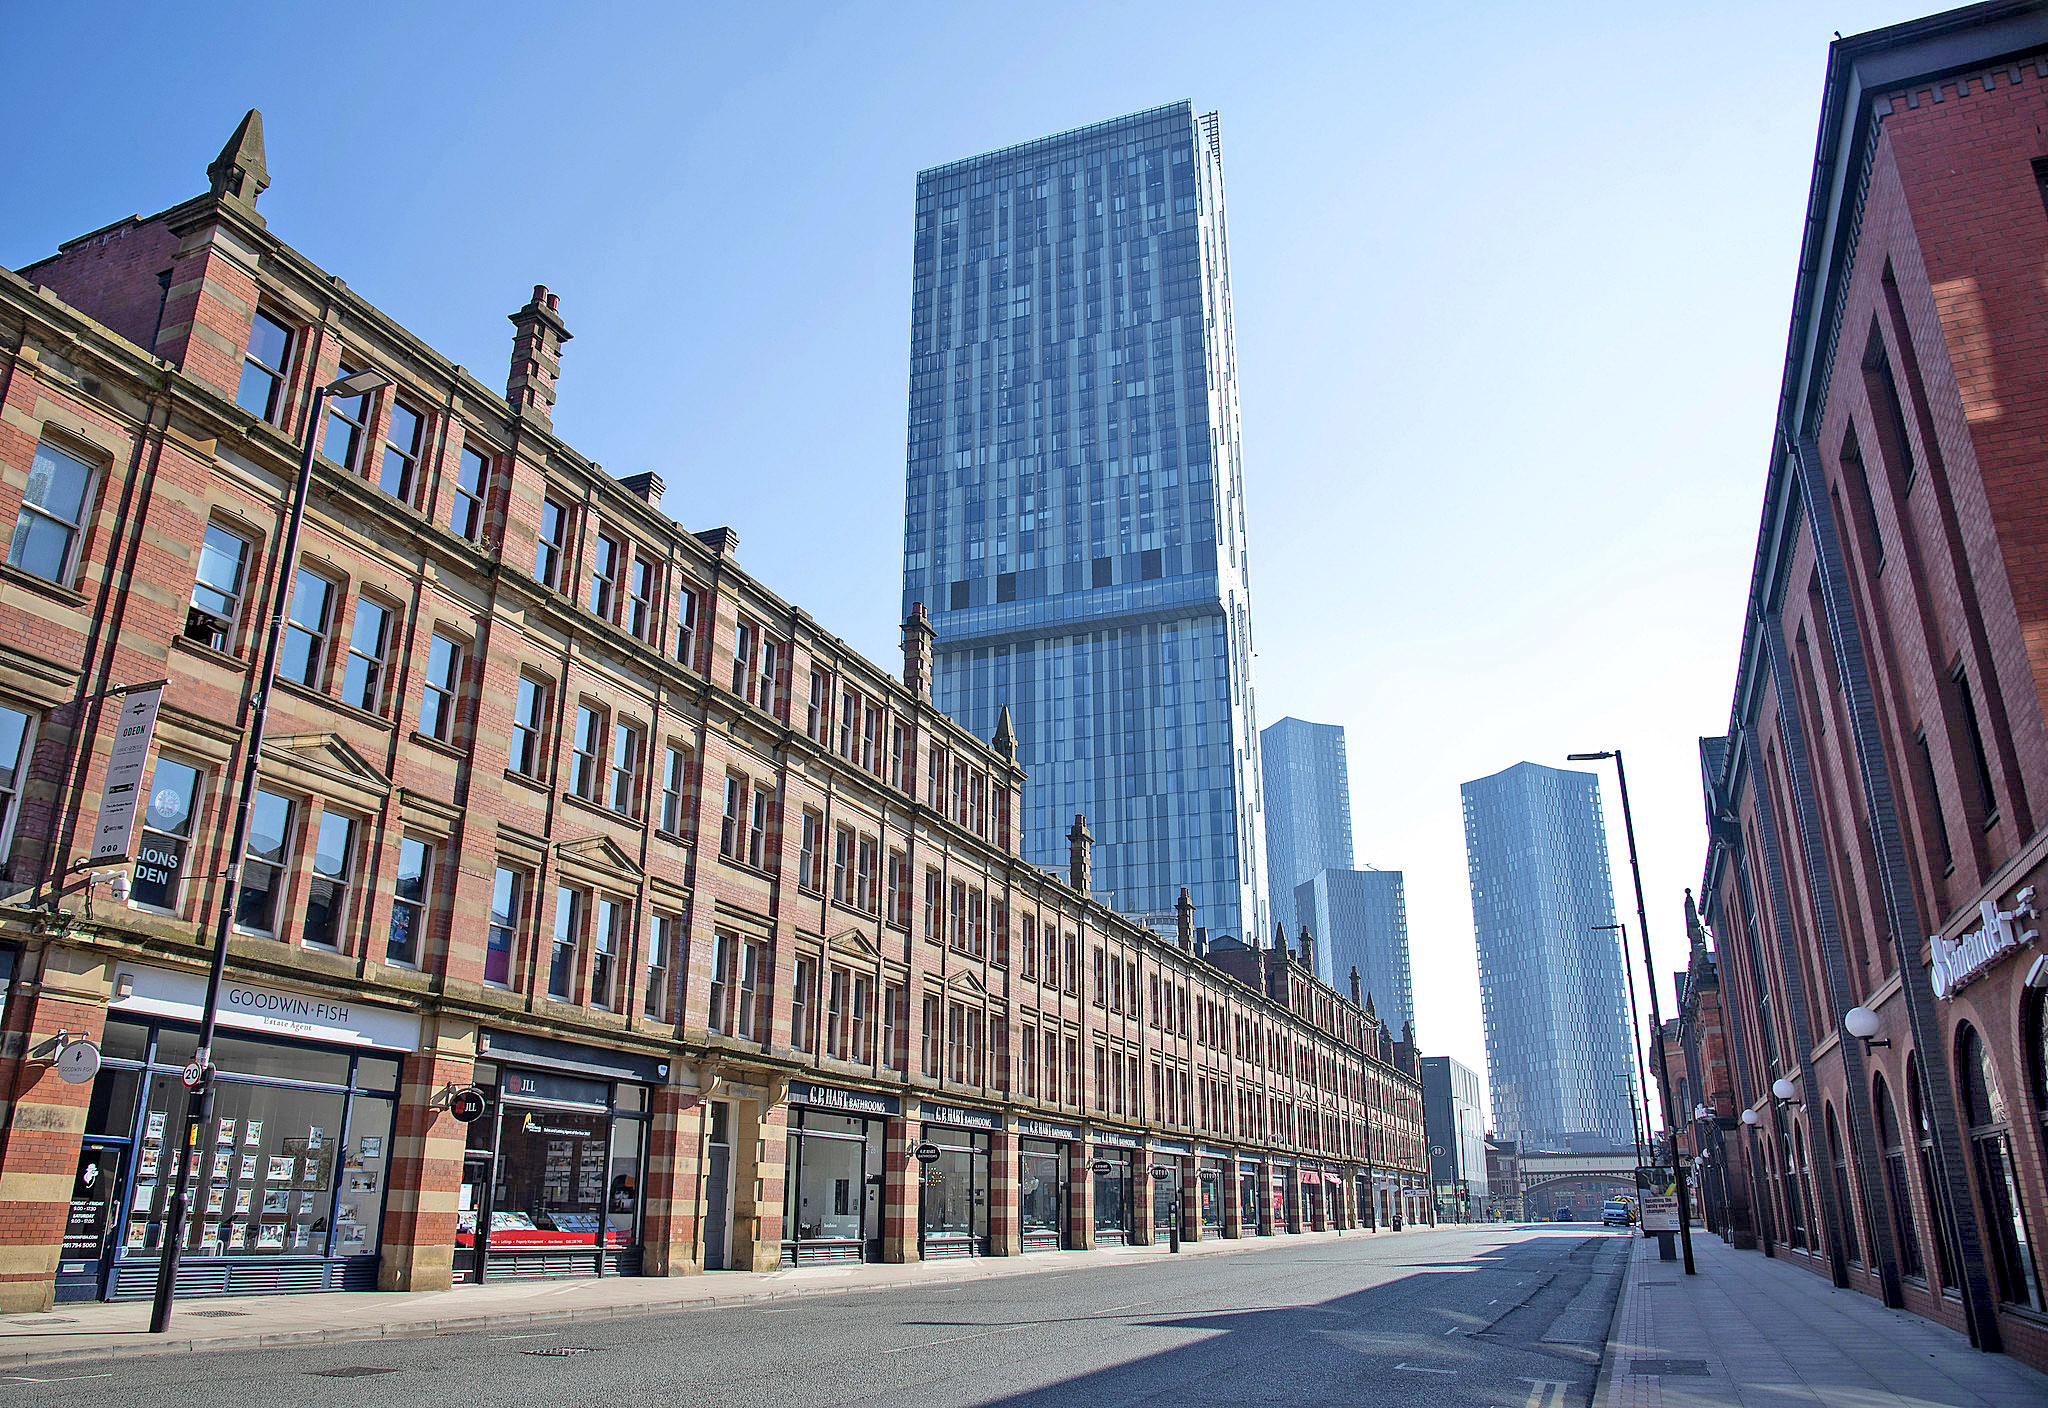 Lockdown Manchester by Harry Howard Potts.jpg